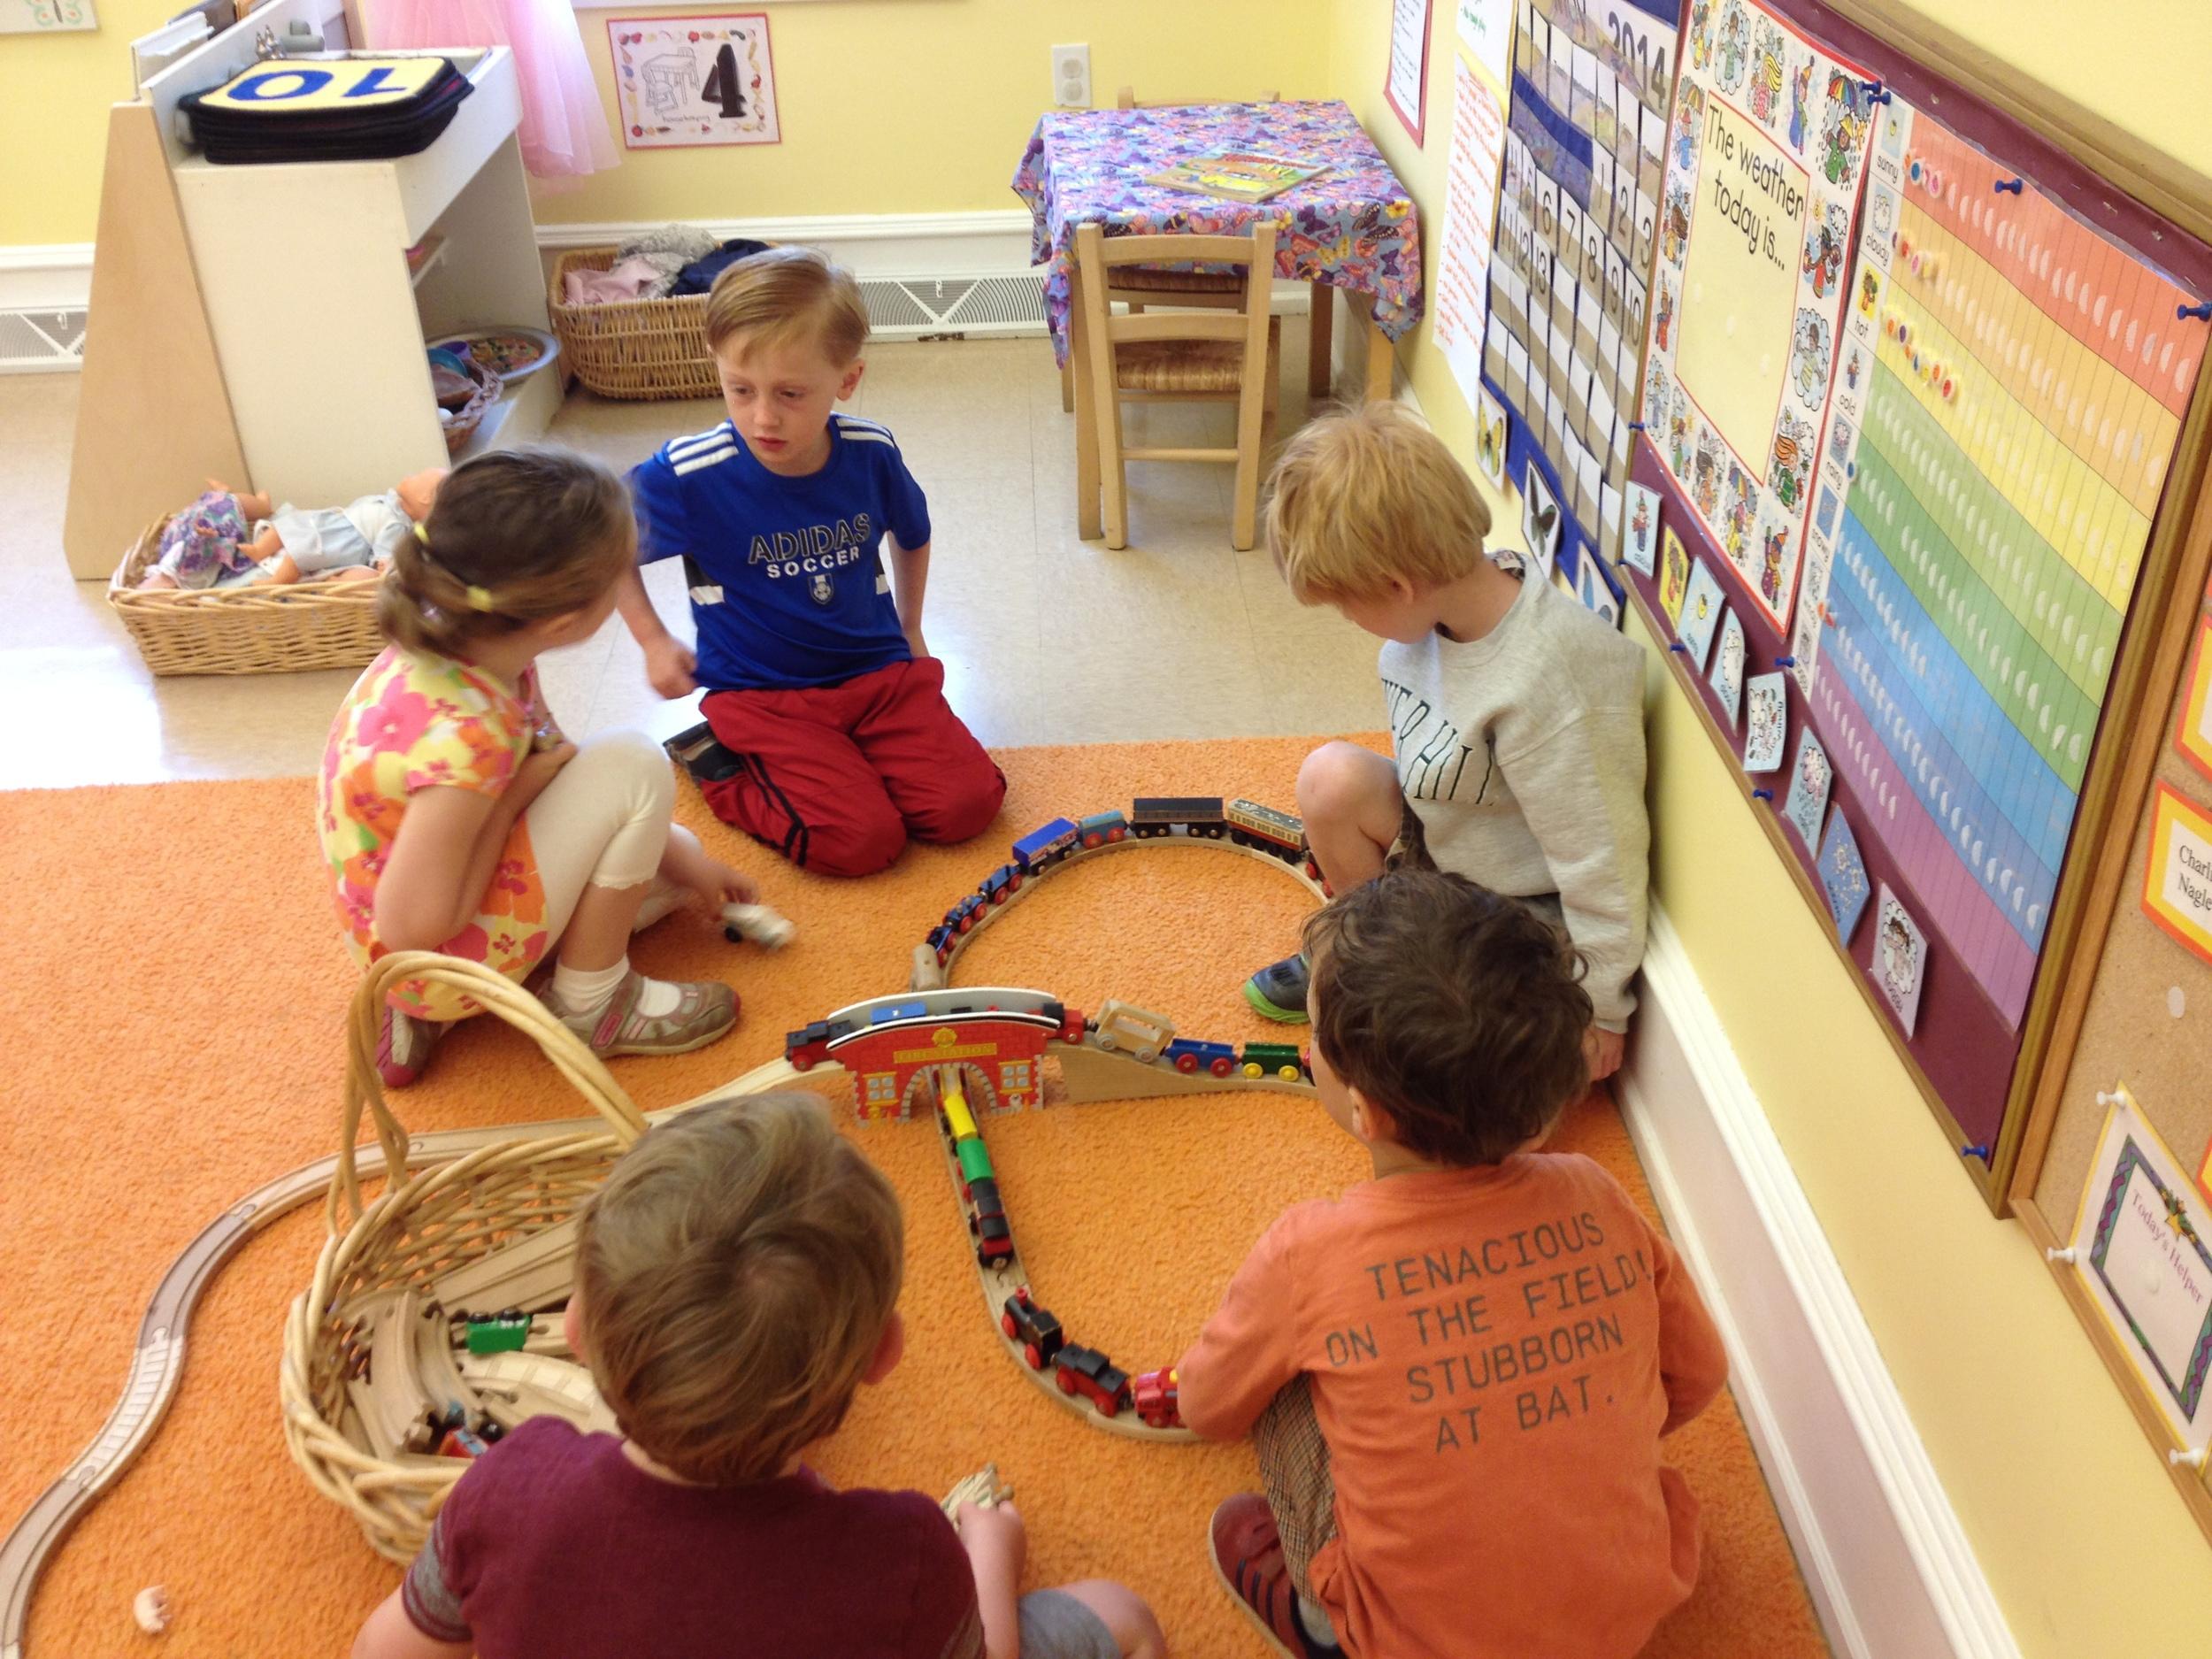 building a train track